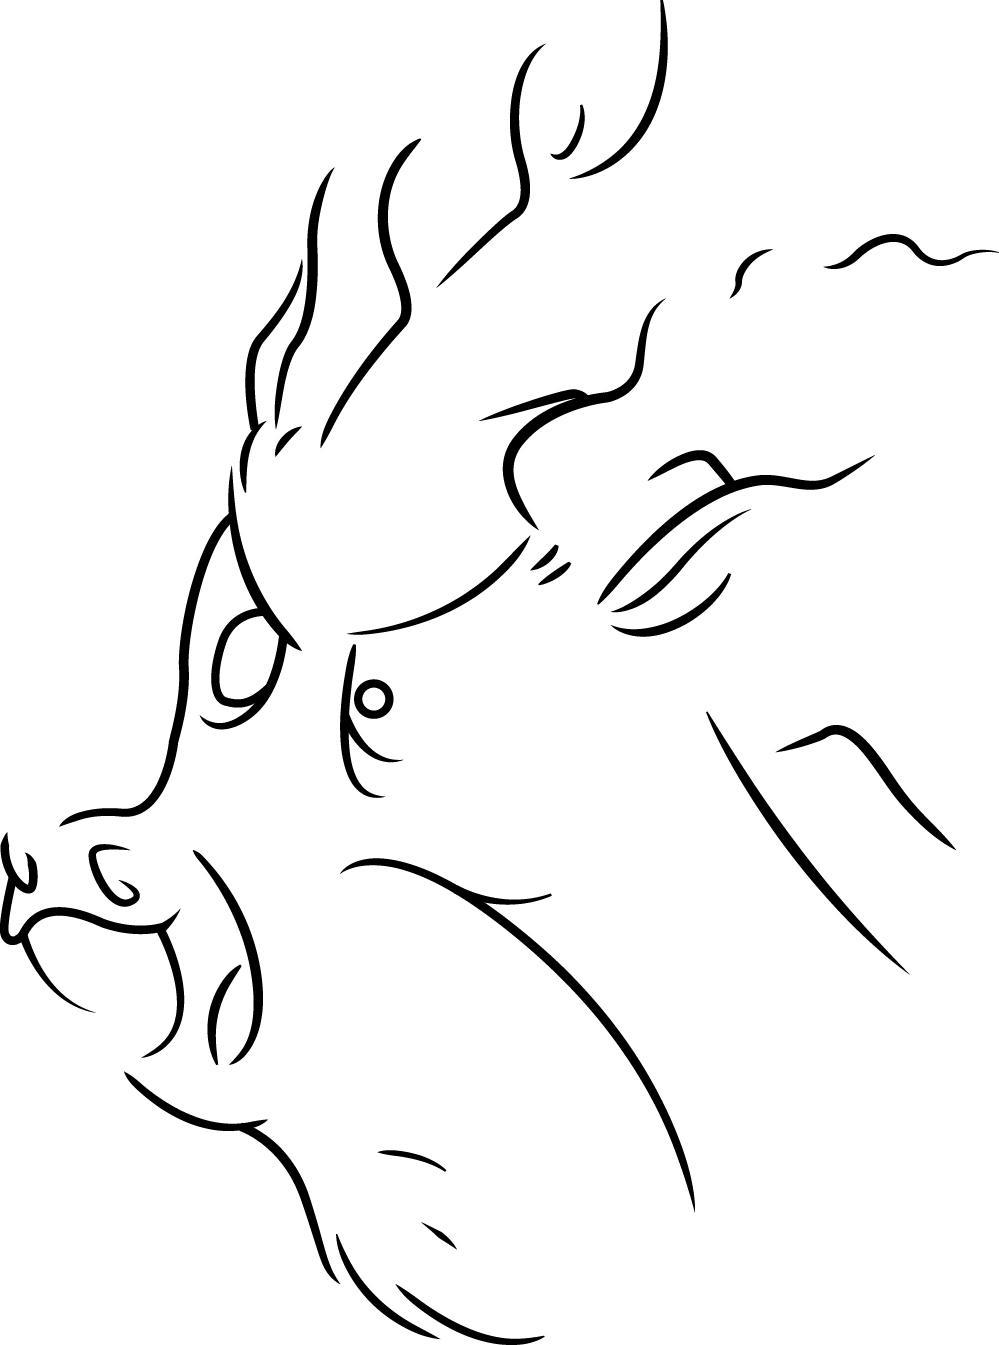 Rydel's Art - Page 4 Discord_by_rydelfox-d4iart5